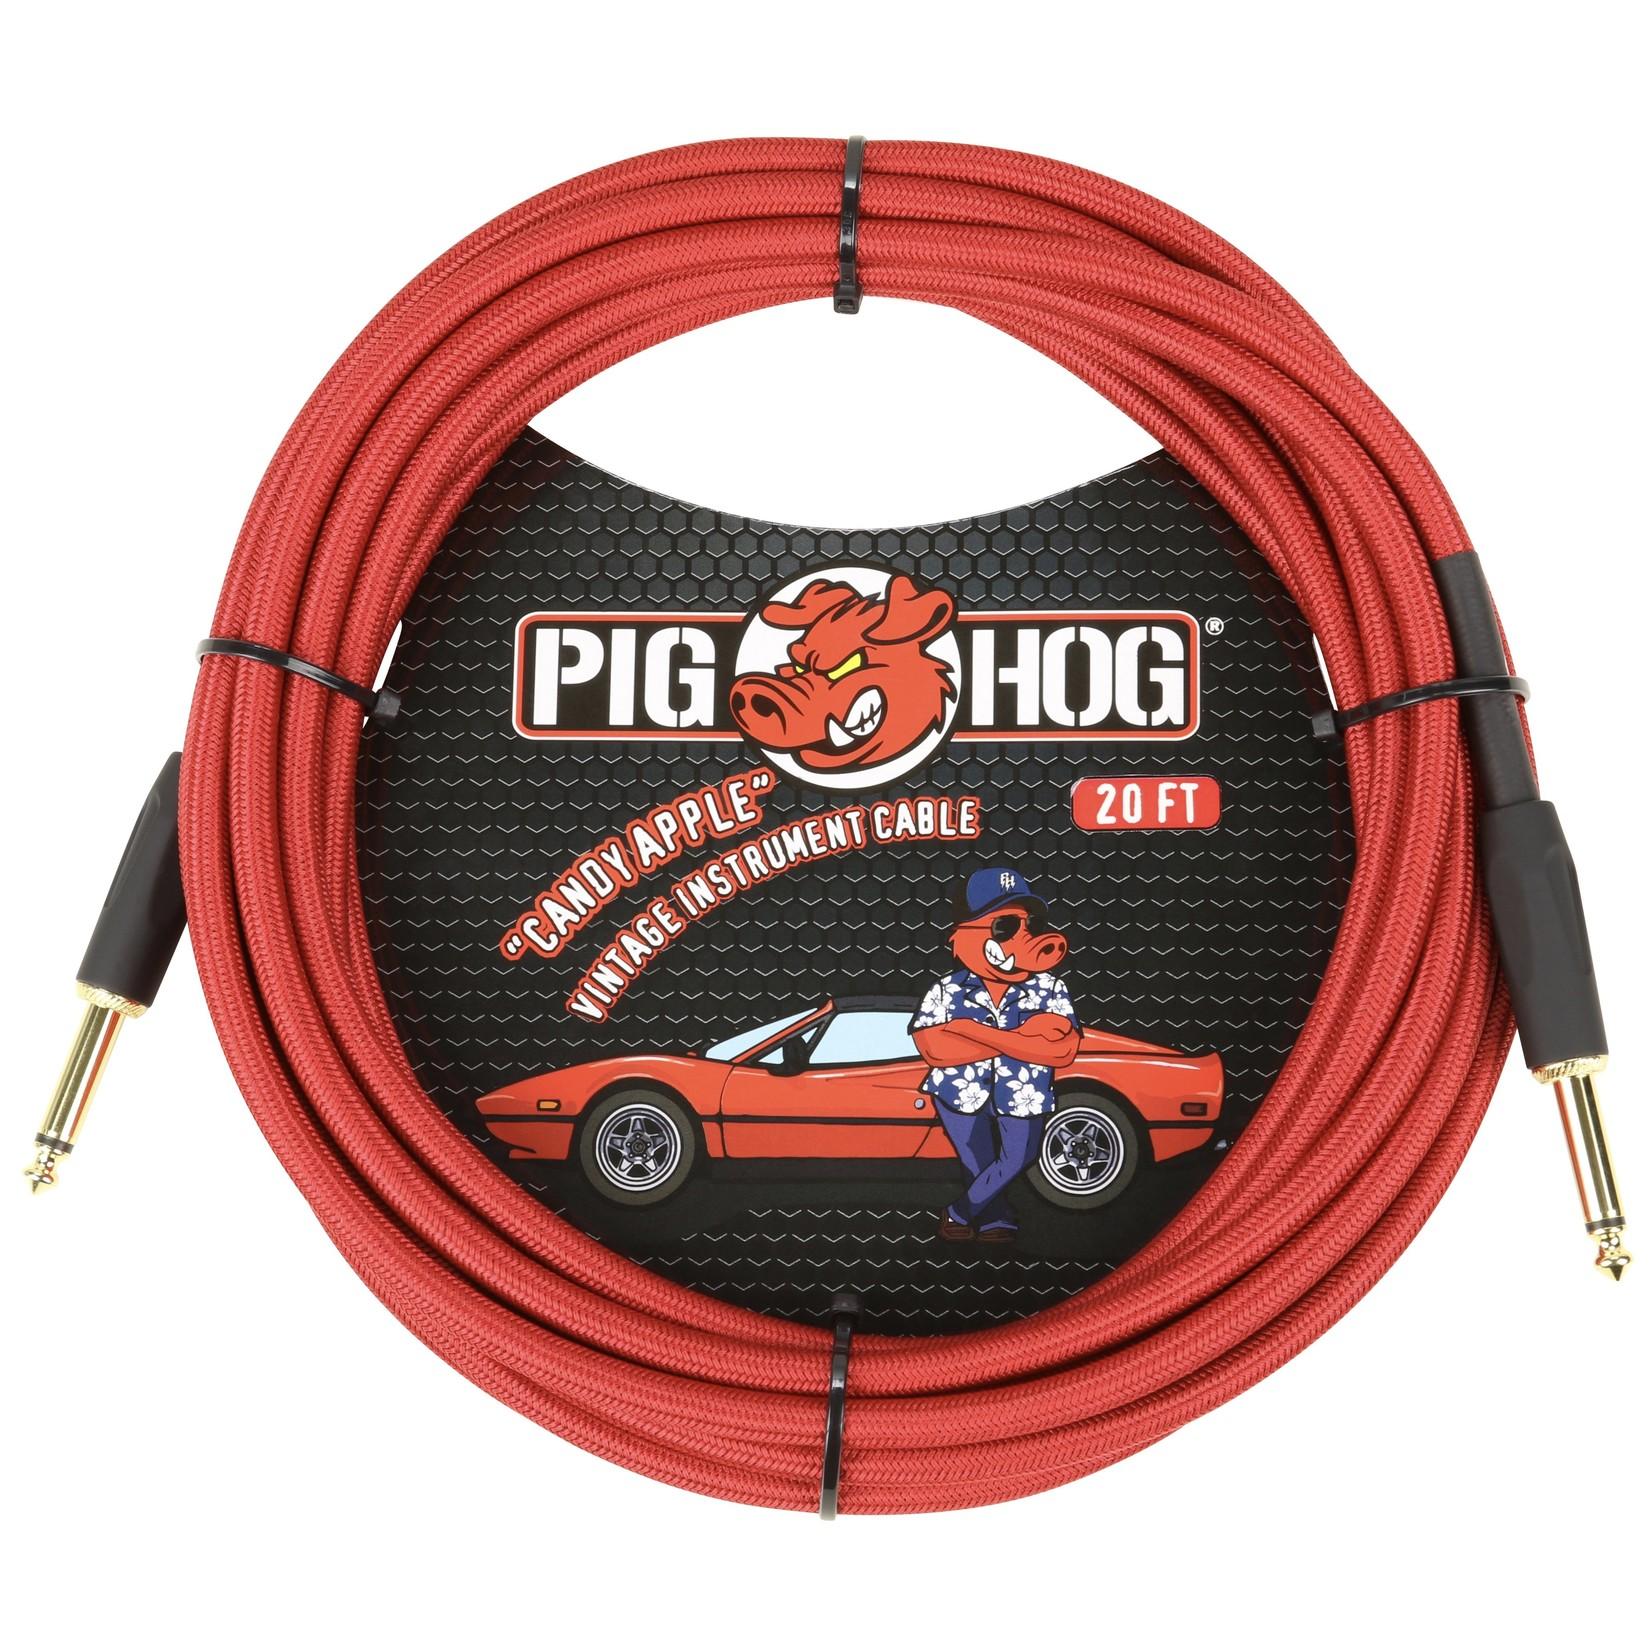 "Pig Hog Pig Hog ""Candy Apple Red"" Vintage Instrument Cable, 20ft Straight (PCH20CA)"